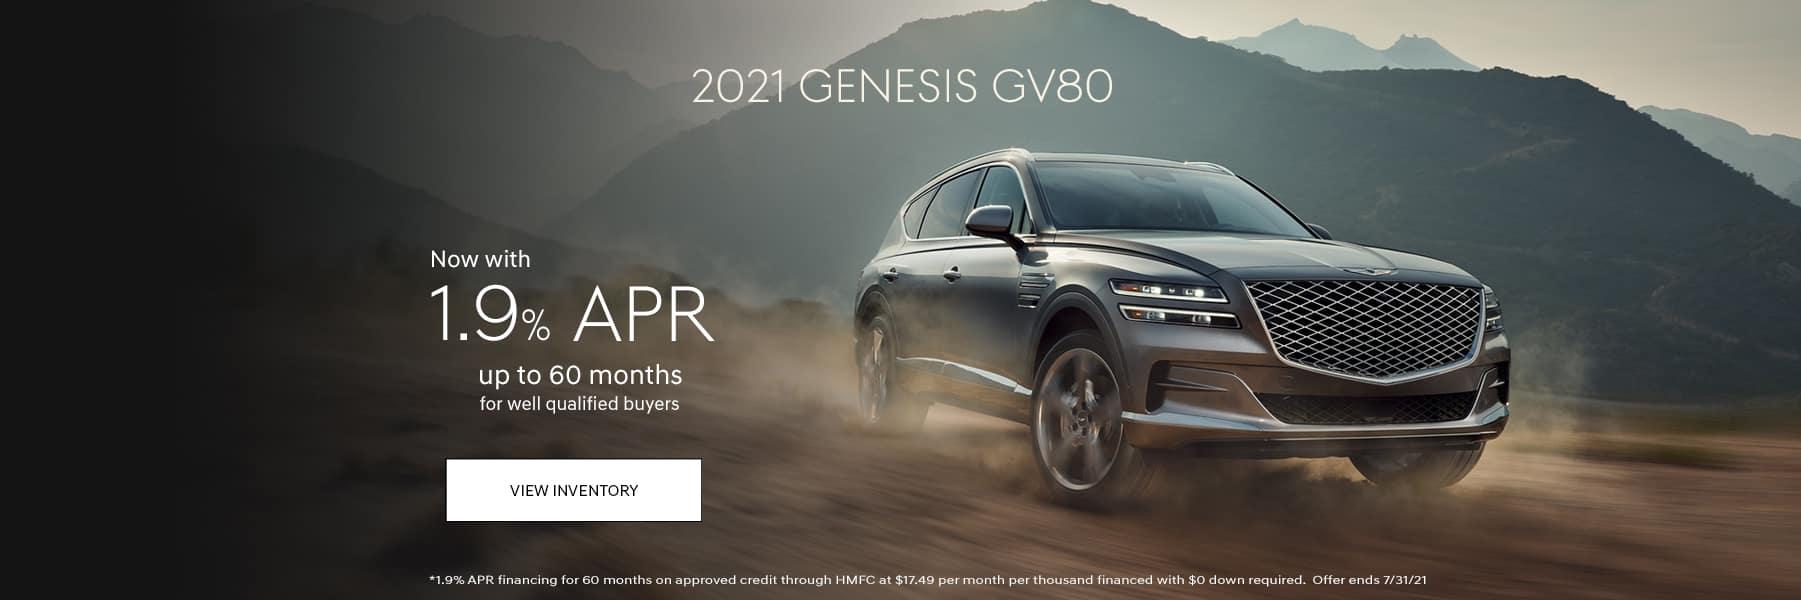 2021-Genesis-GV80-Jul21